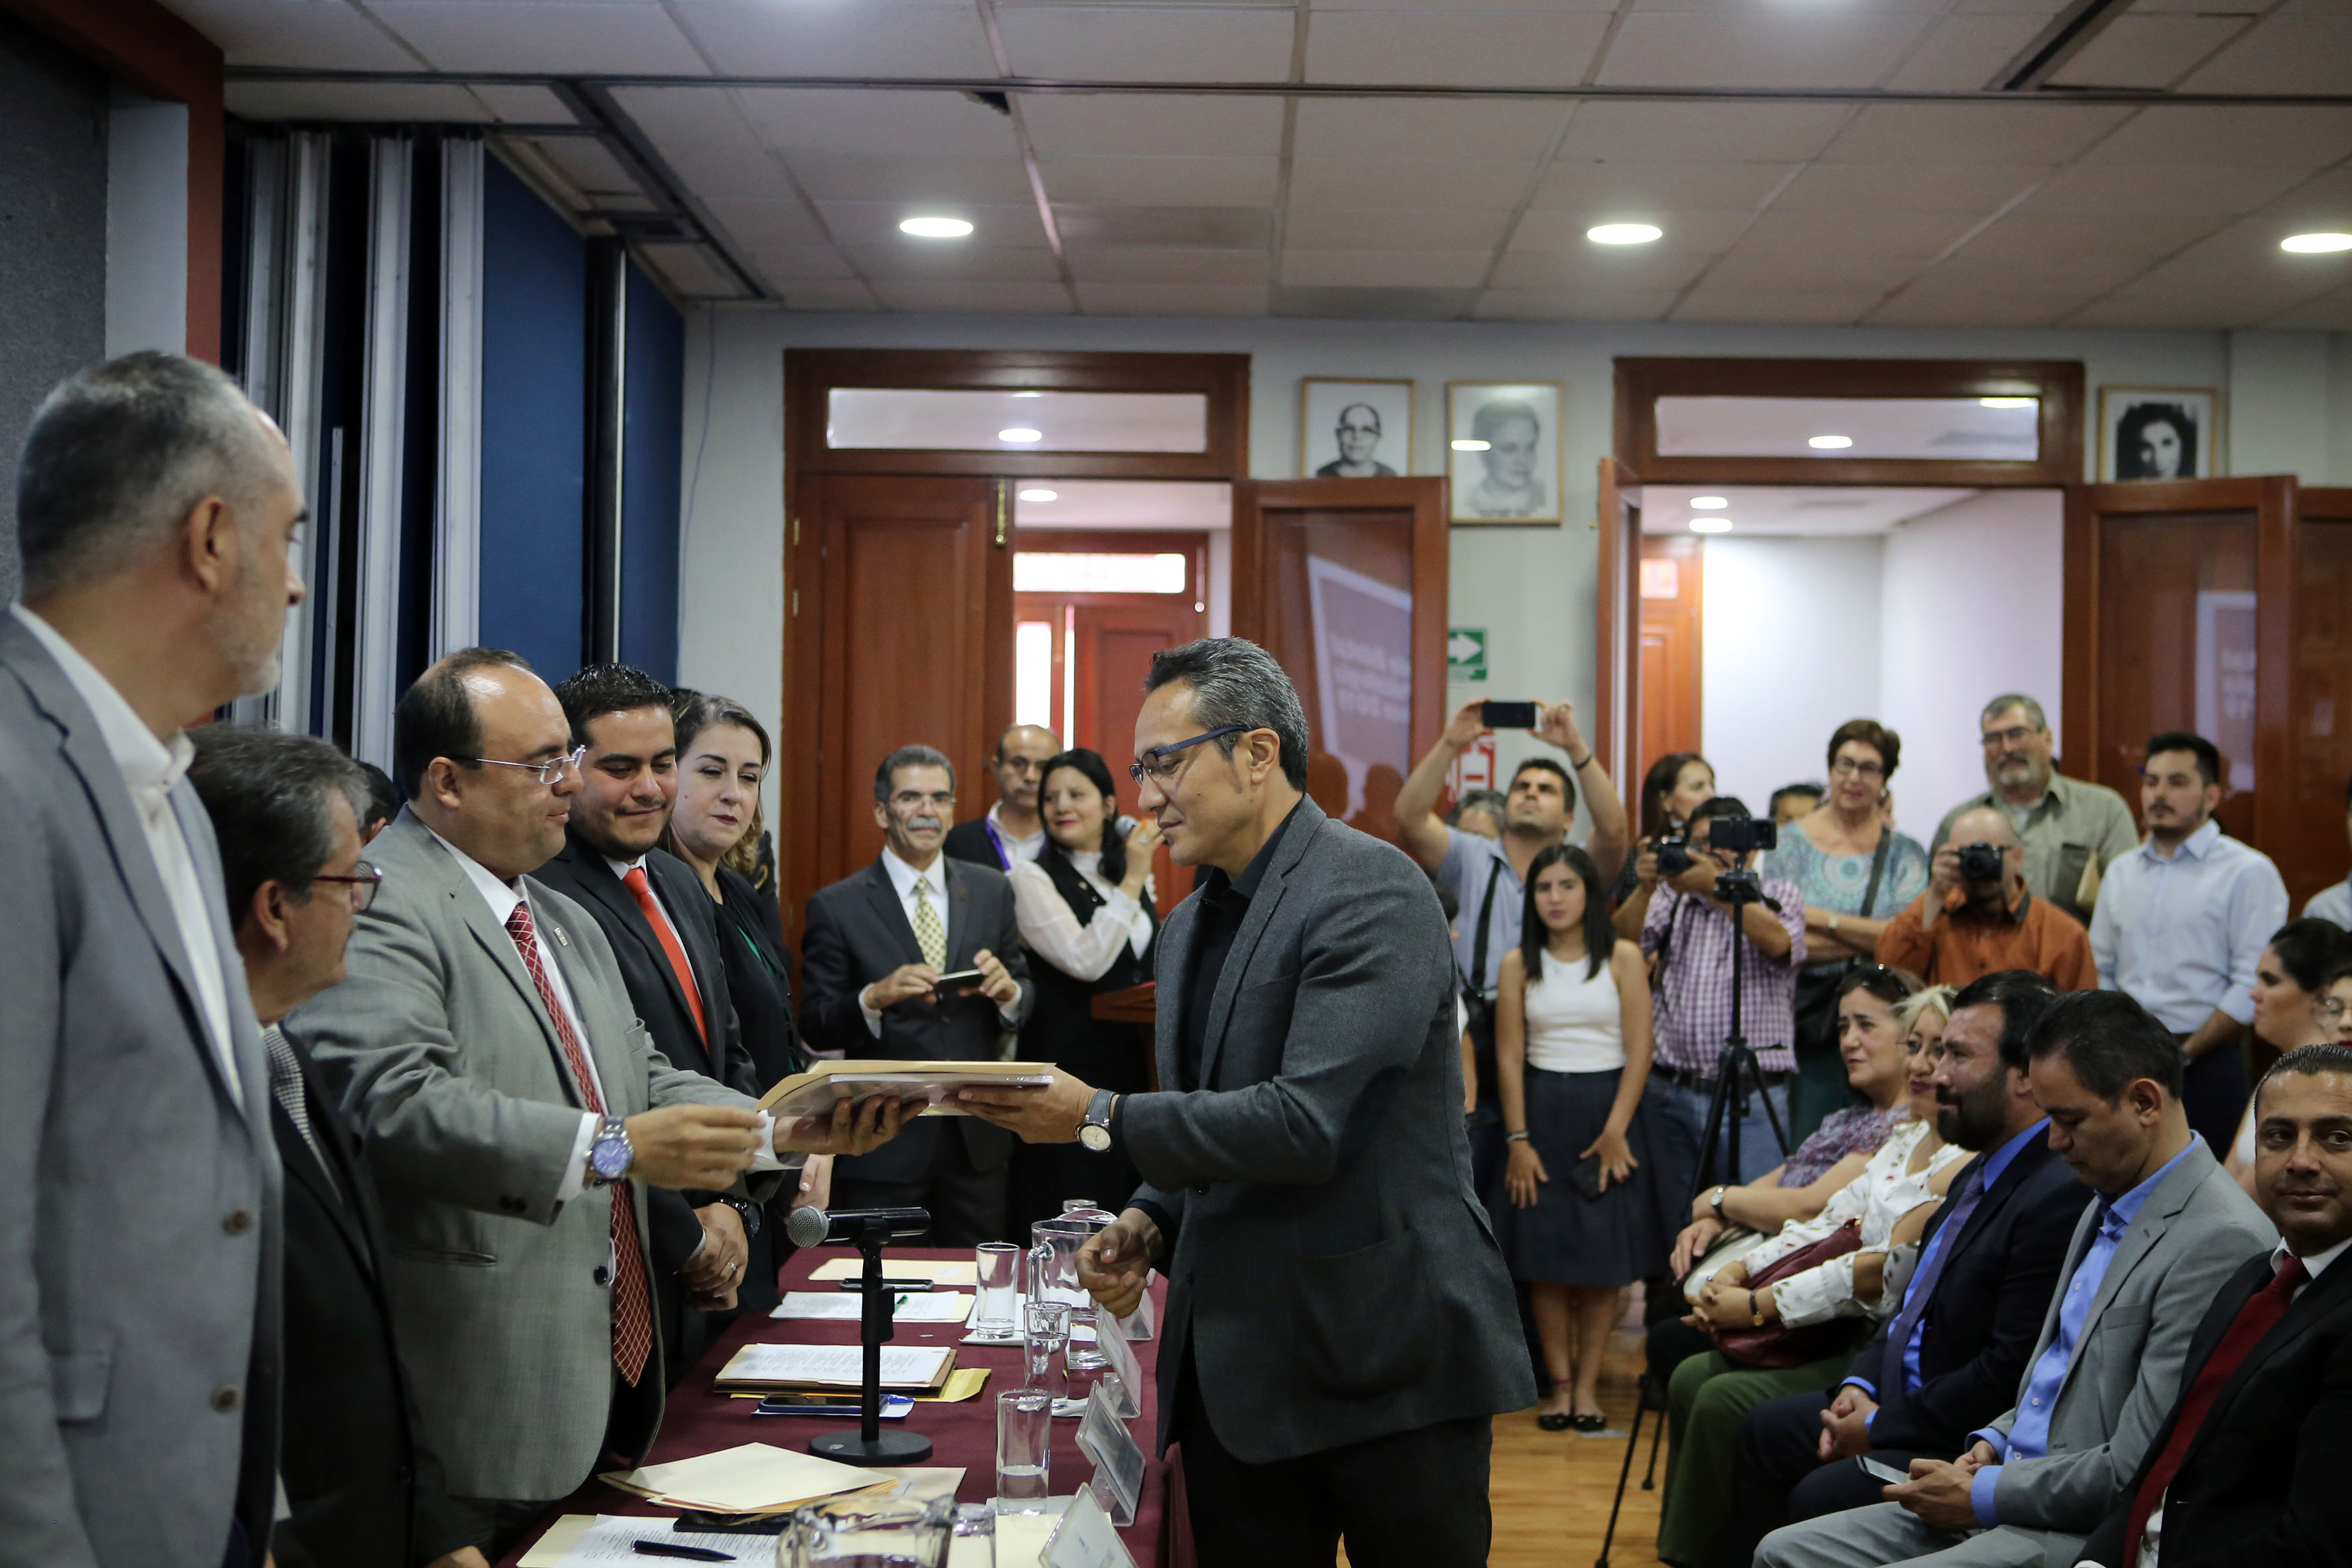 Dr. Arturo González Lozano, recibiendo premio